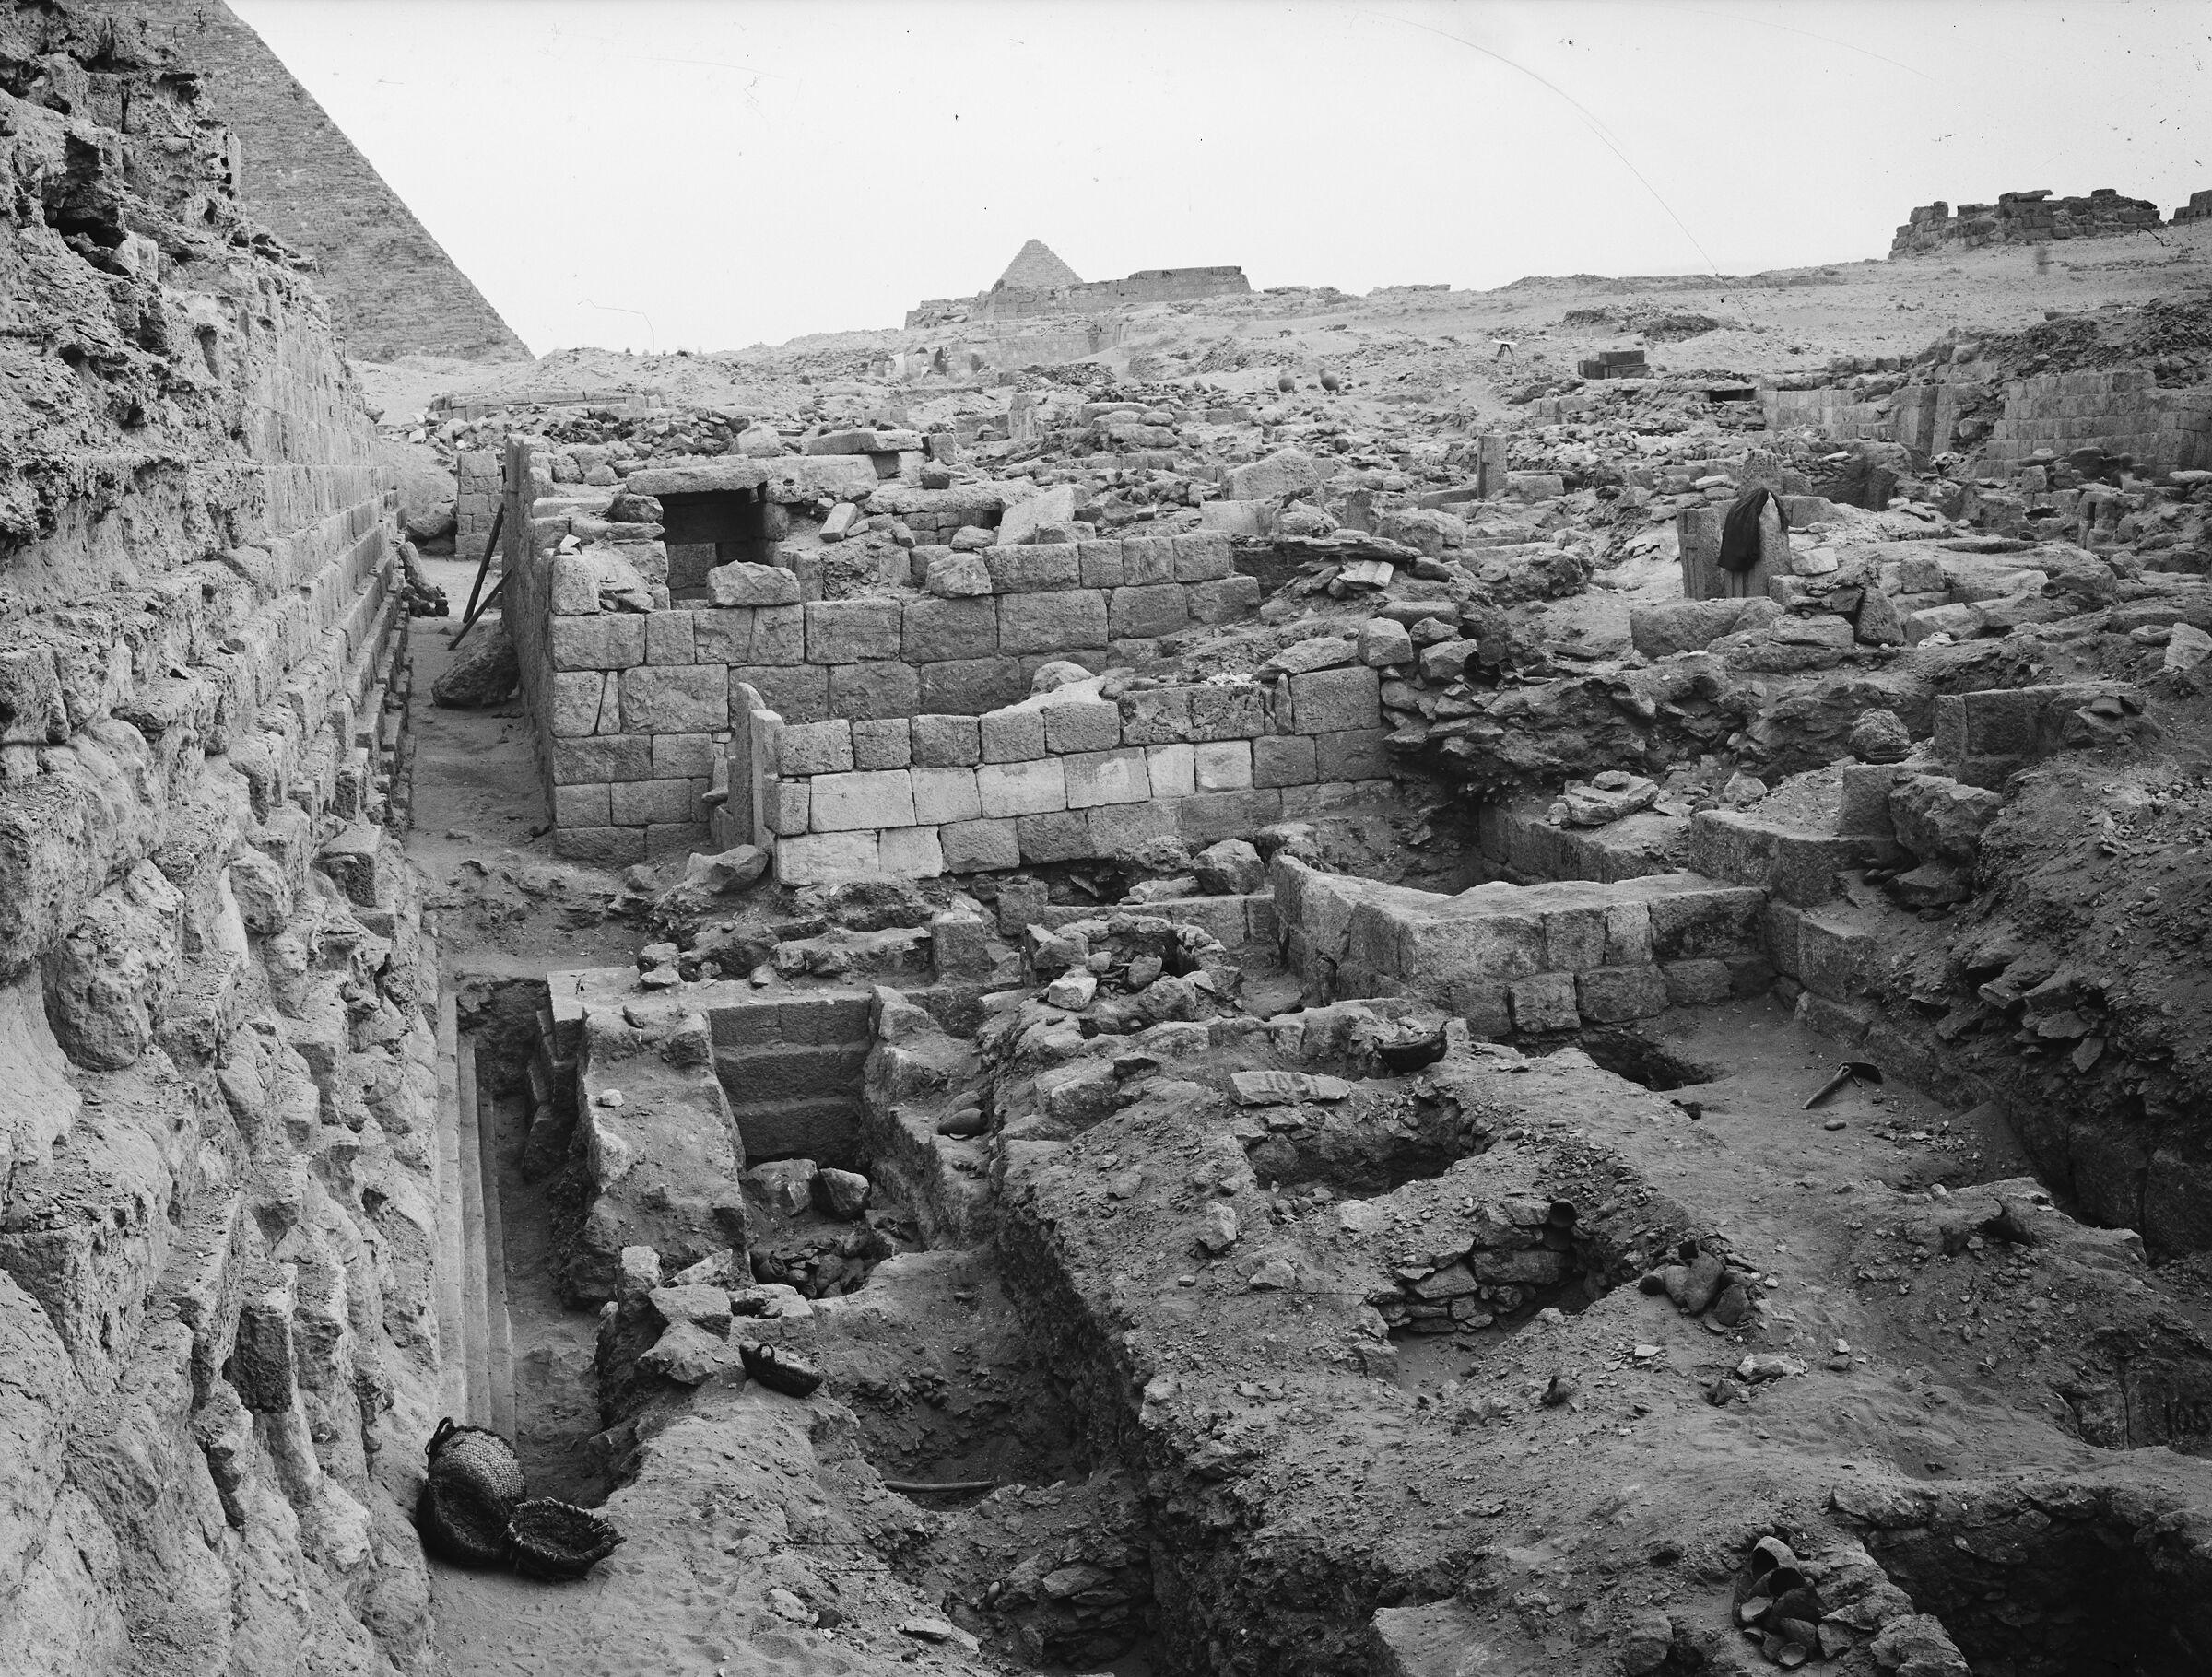 Western Cemetery: Site: Giza; View: G 1051, G 1050, G 1086, G 1085, G 1049, G 1048, G 1047